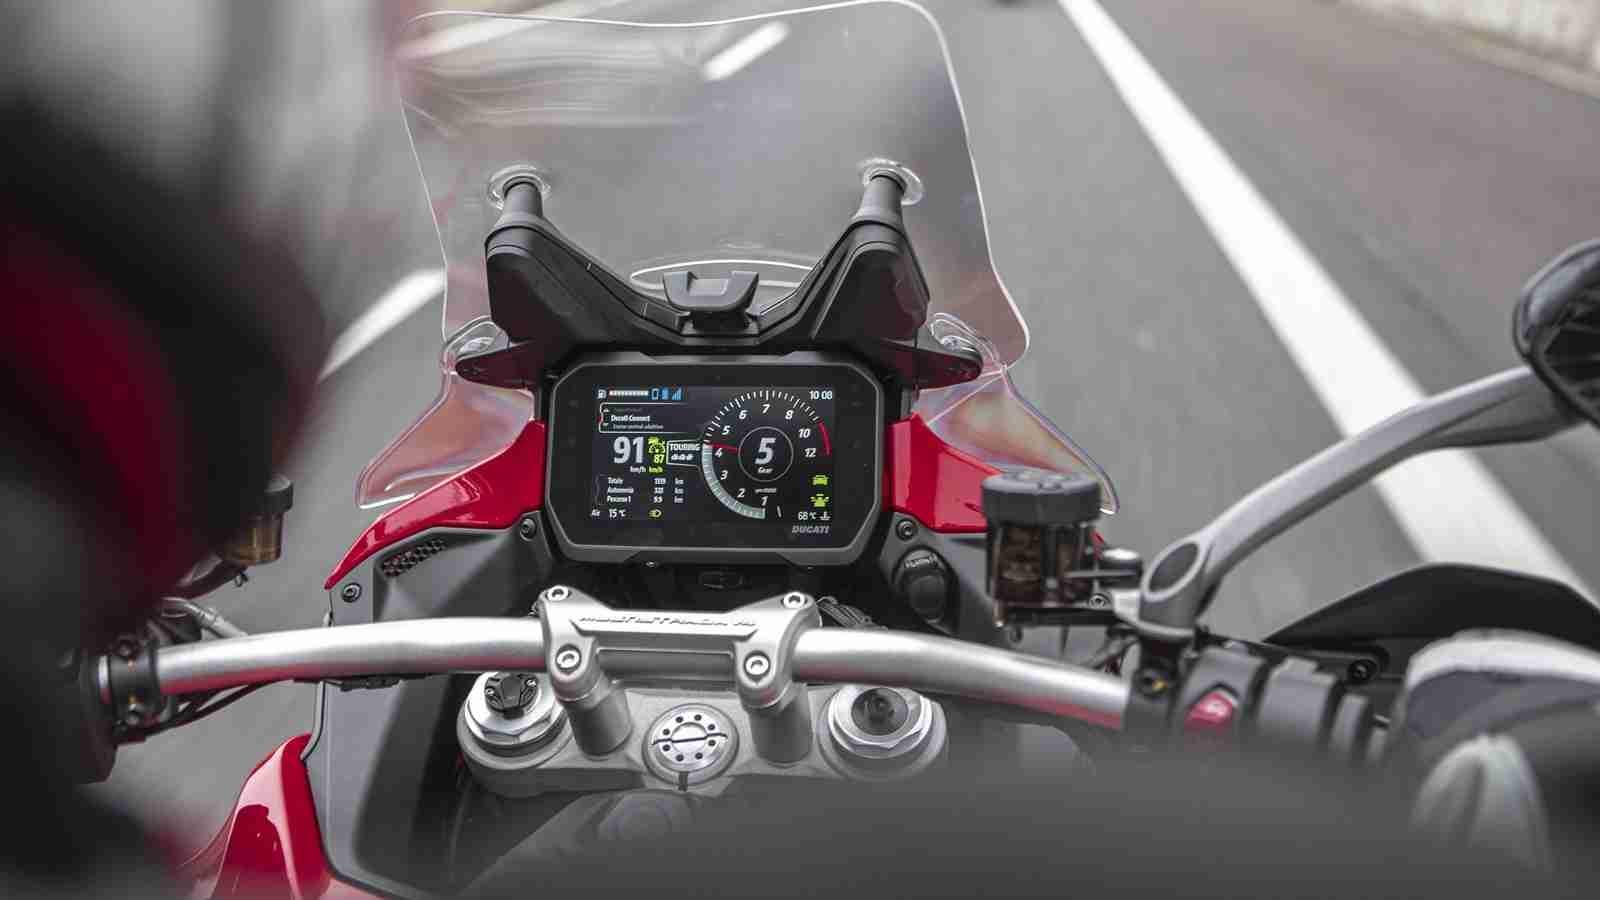 Ducati Multistrada V4 S TFT digital screen